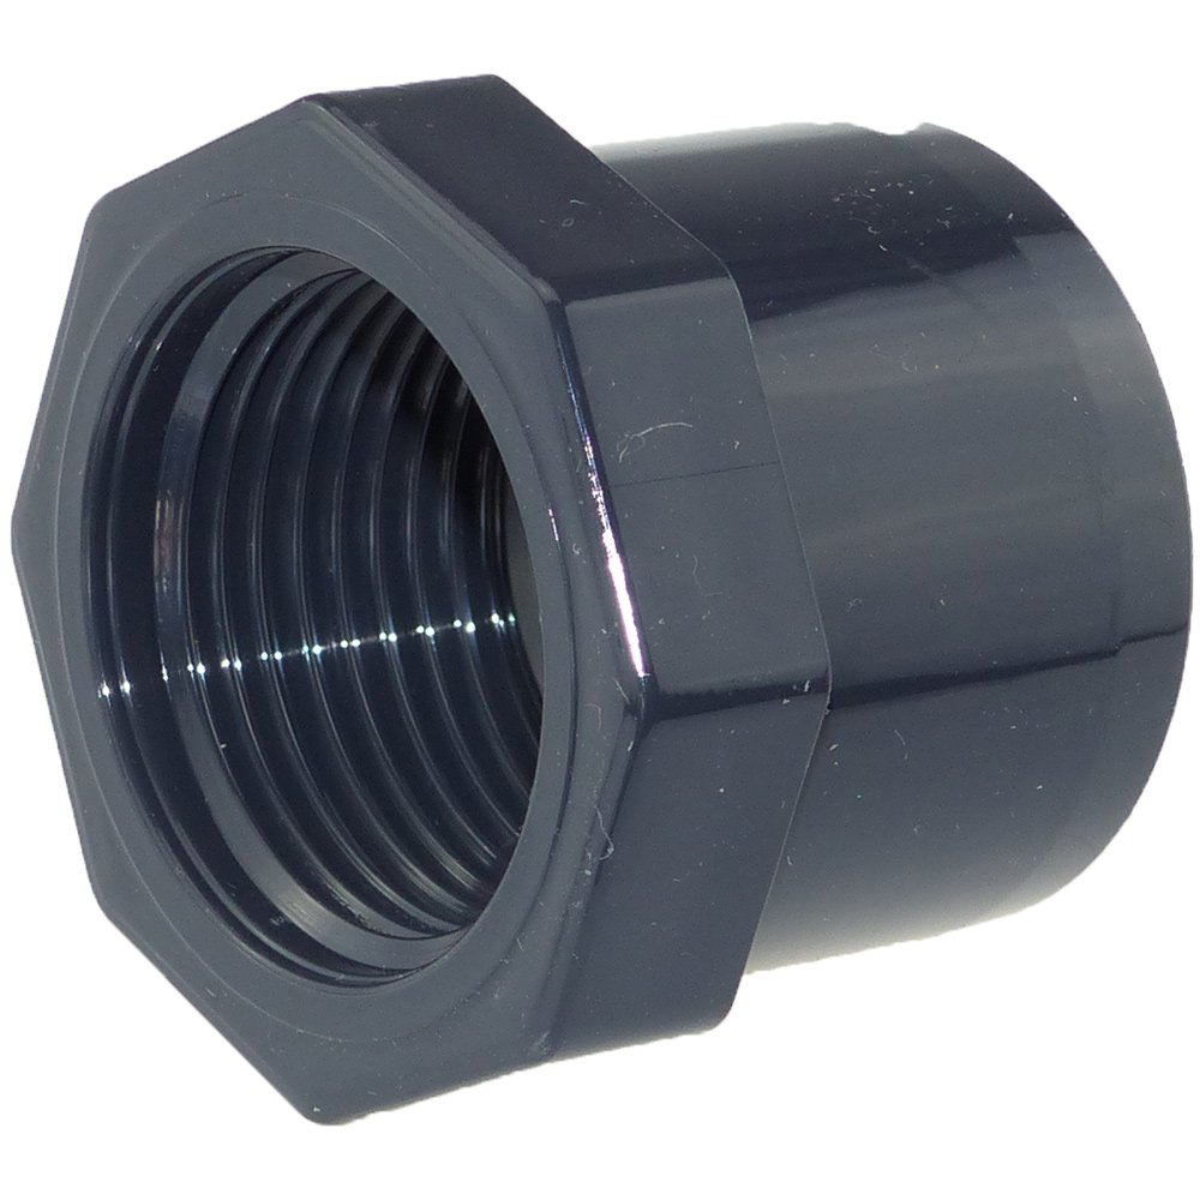 Cepex/Plimat/CH PVC Reduzierstutzen 40 mm x 1/2 Zoll